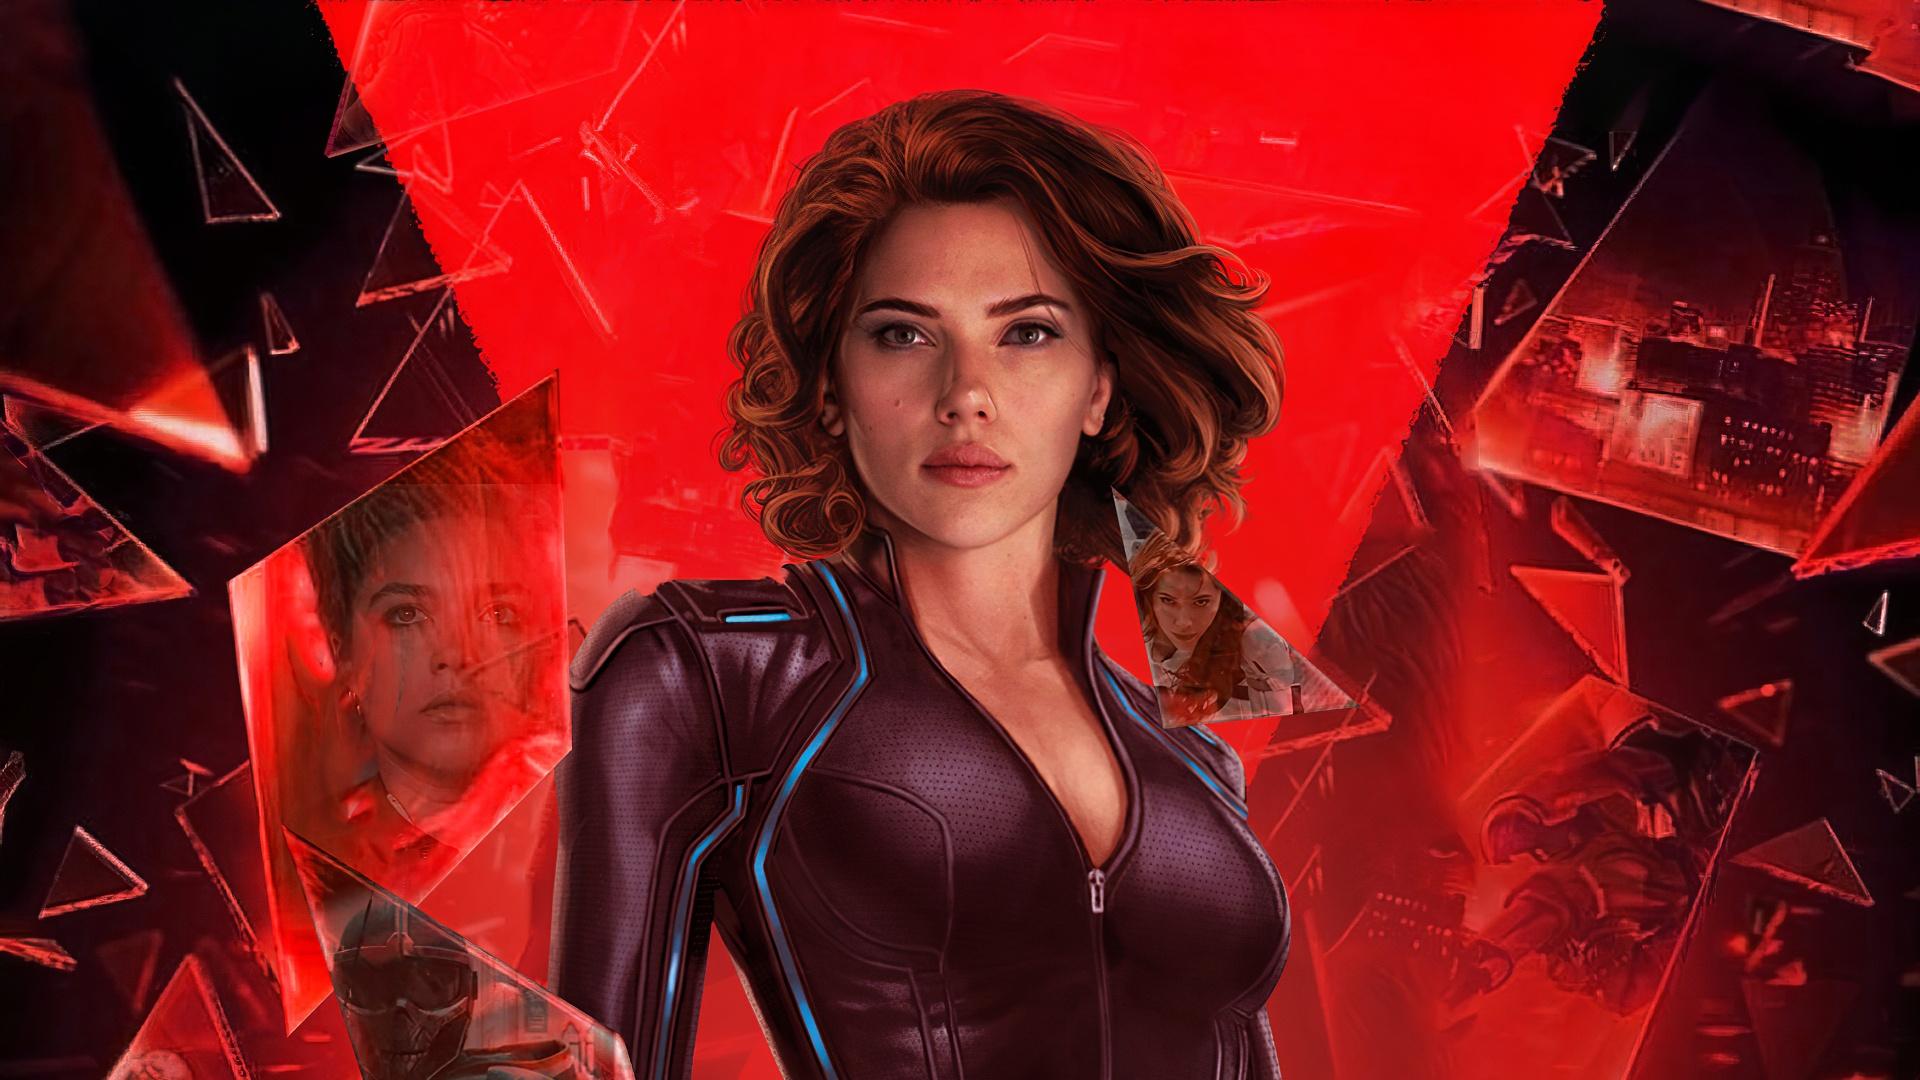 Black Widow free background